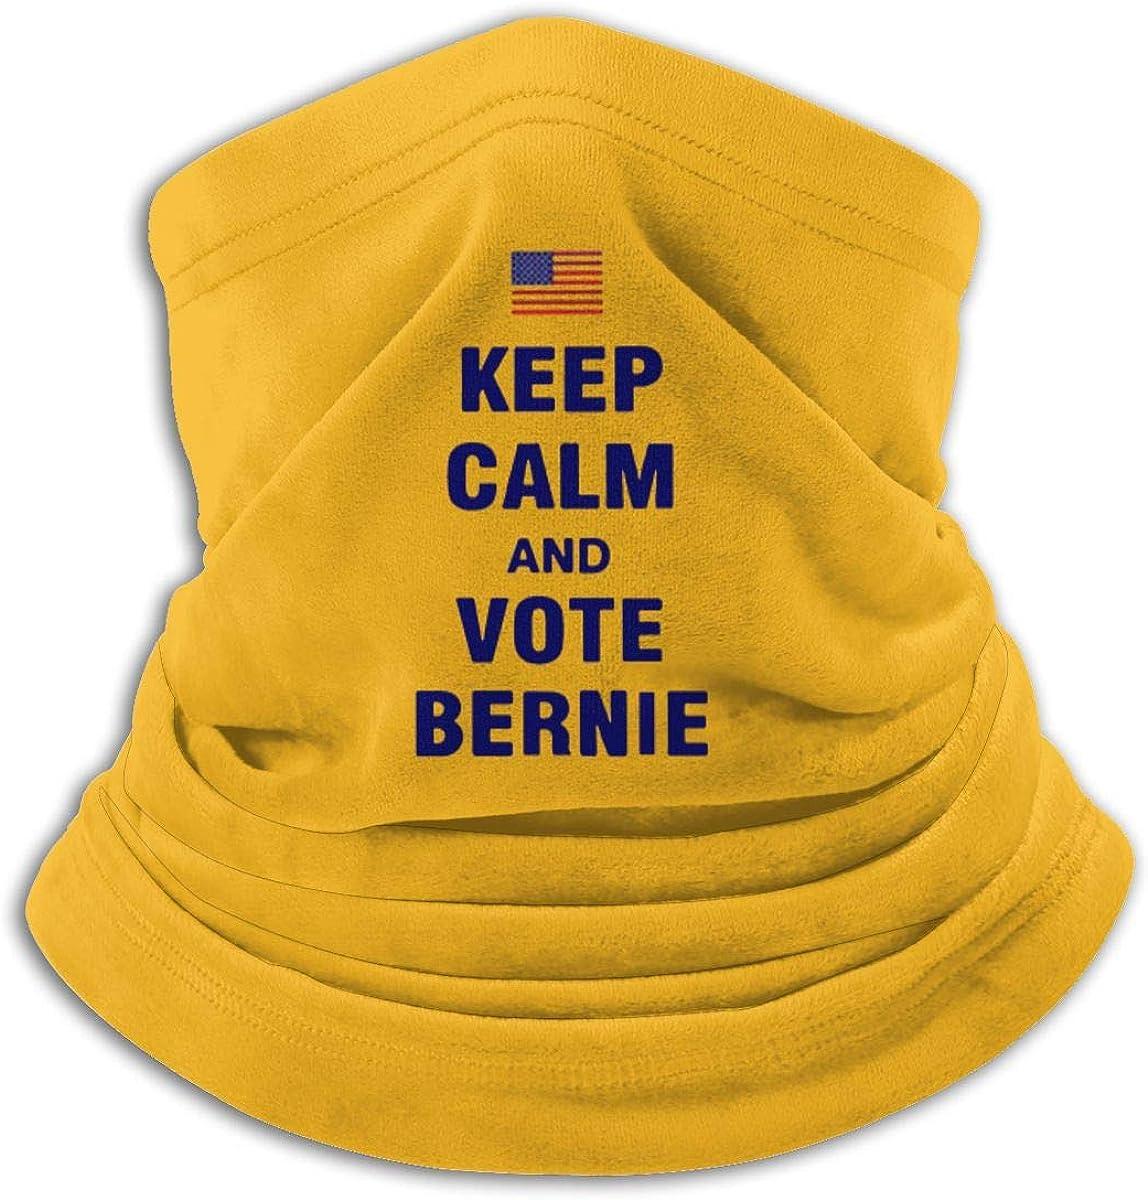 Vote Bernie Sanders 2020 Black Multi-function Neck Warmer Gaiter Polyester Neck Warmer Windproof Winter Neck Gaiter Cold Weather Scarf For Men Women